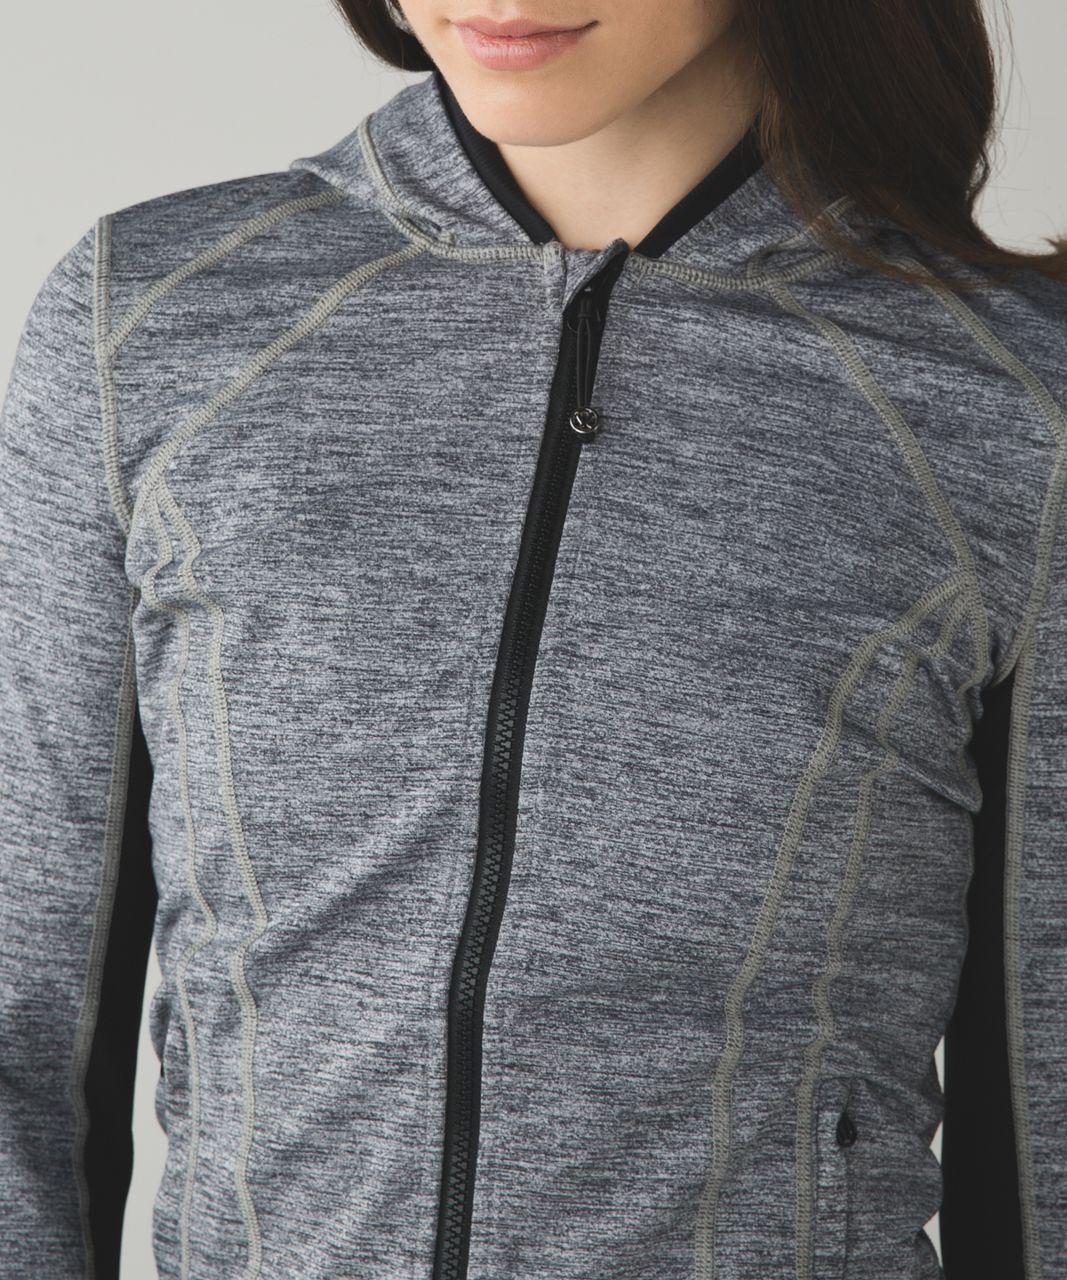 Lululemon Daily Practice Jacket - Space Dye Camo Black Dark Slate / Black